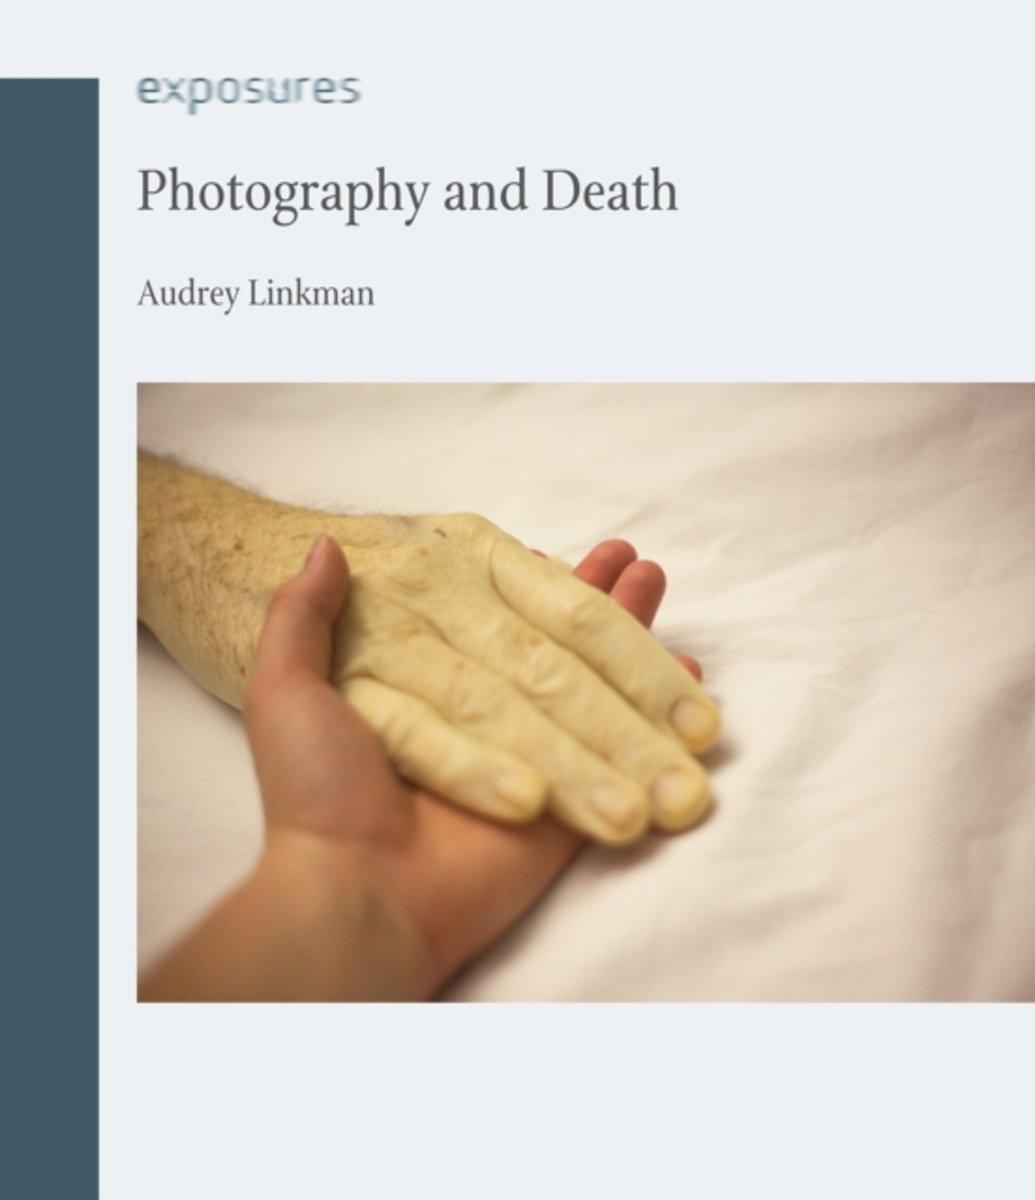 Audrey Linkman: Photography and Death<br />London, Reaktion Books<br />2011